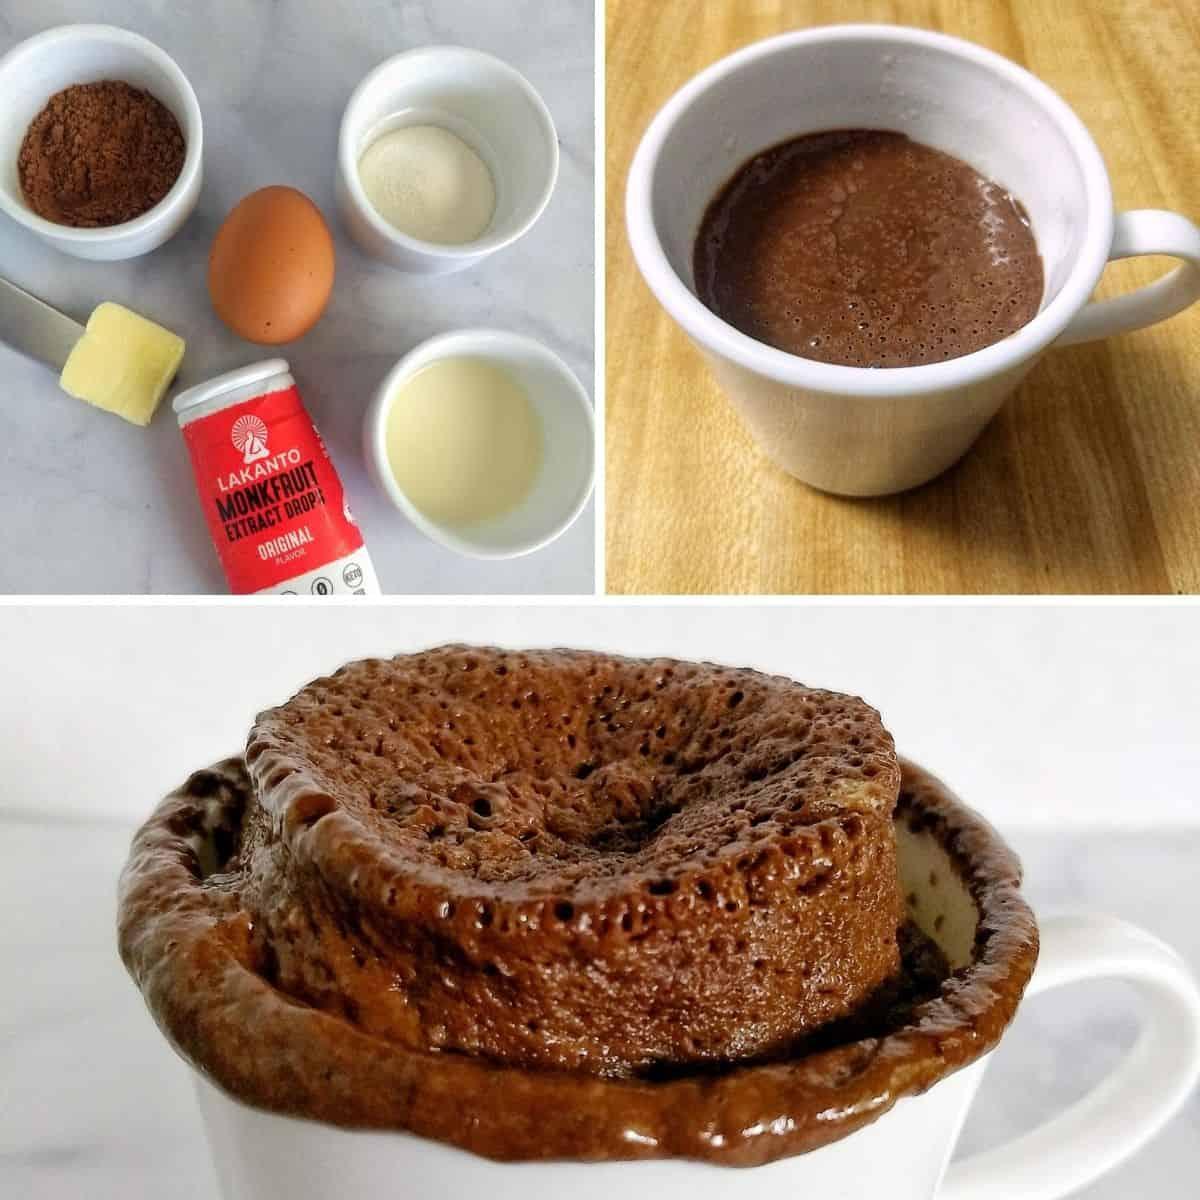 keto chocolate mug cake steps - Keto Chocolate Mug Cake